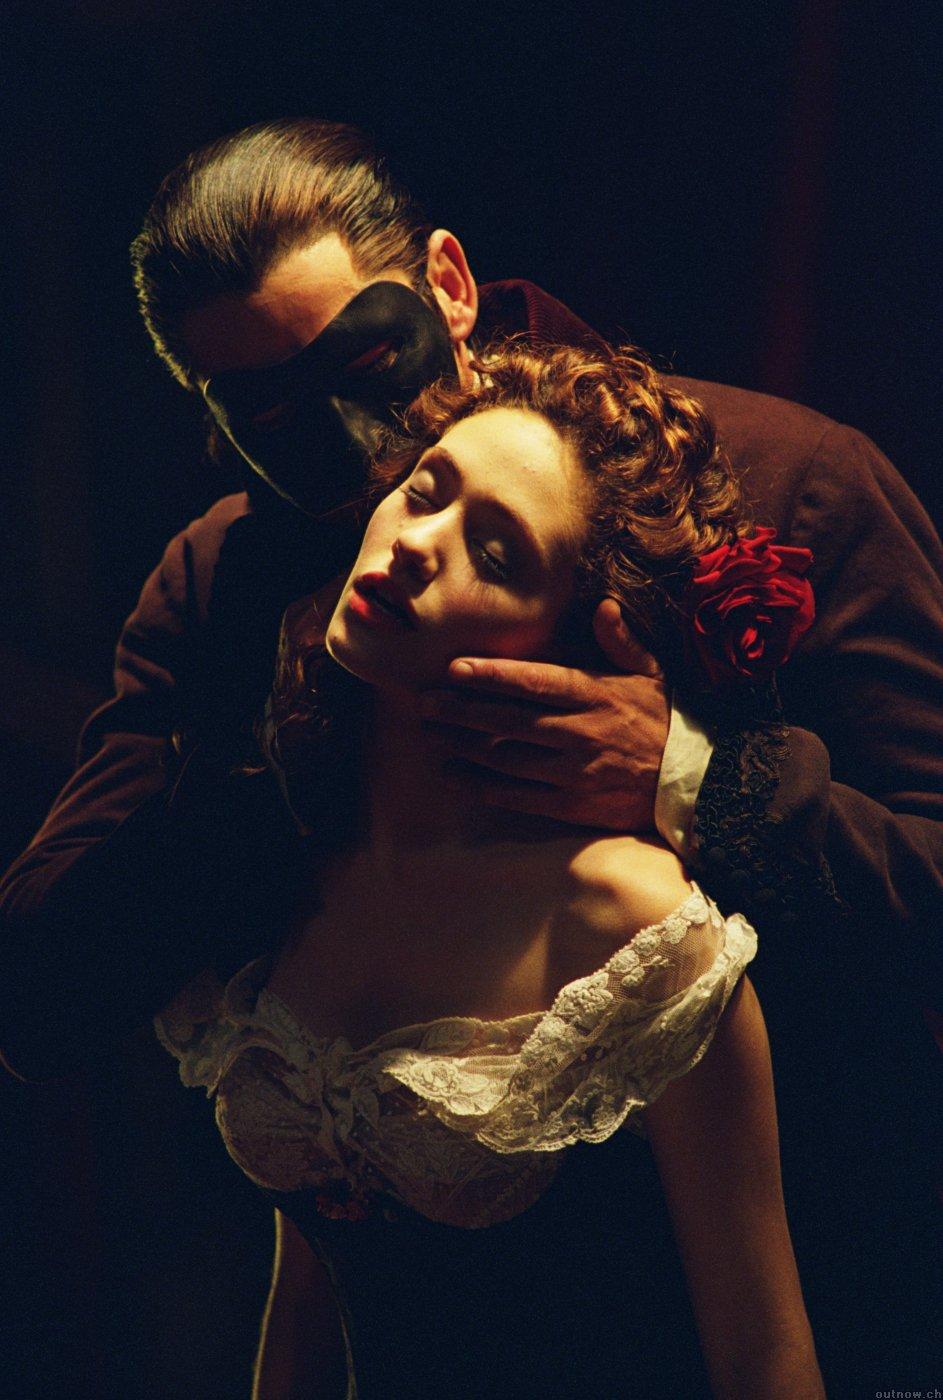 phantom of the opera essay questions